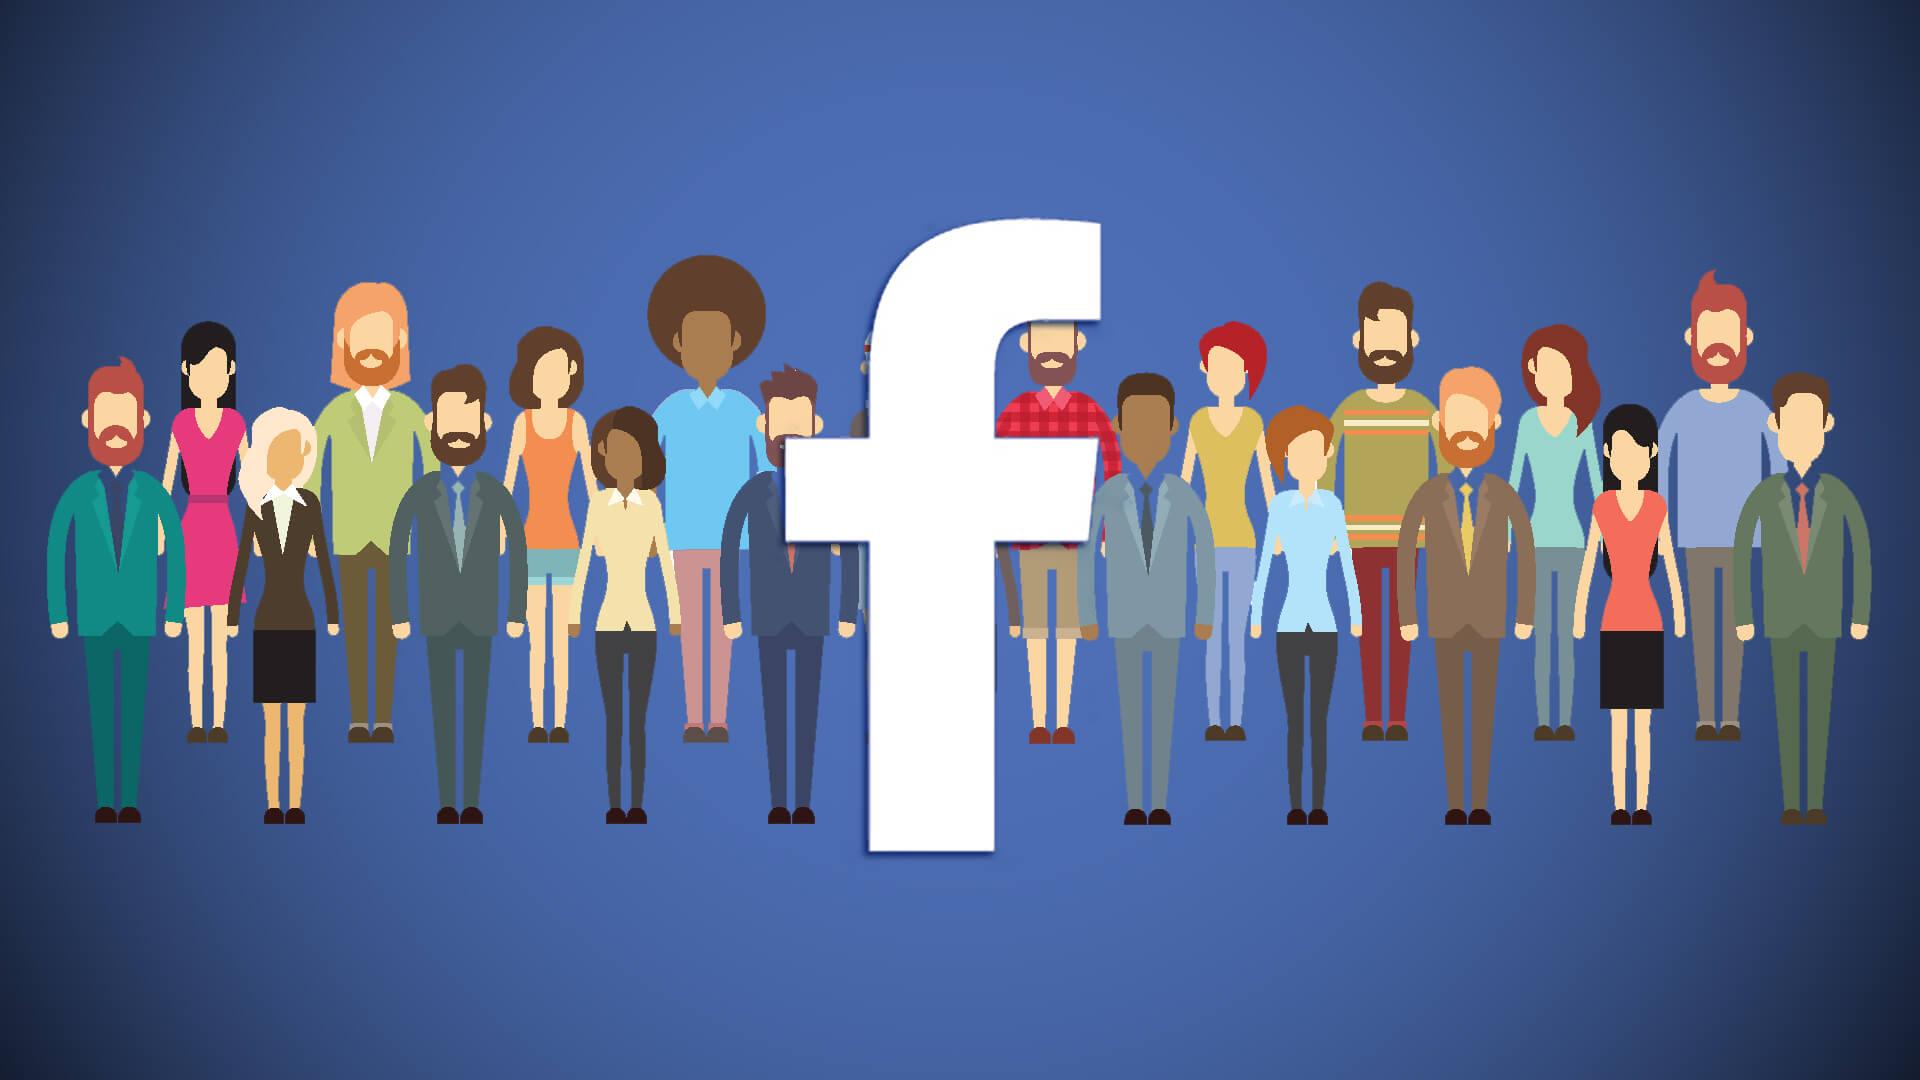 LIbertic facebook